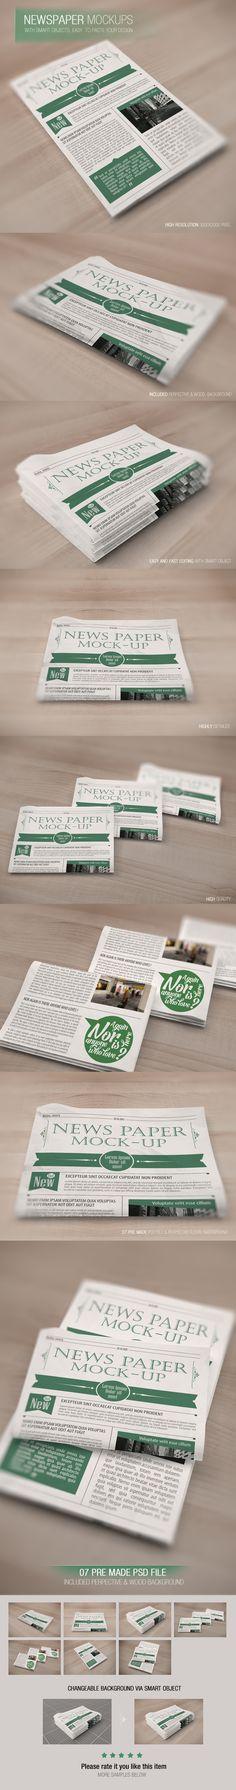 Newspaper mockup by Wutip Team http://on.be.net/1qM4Koq